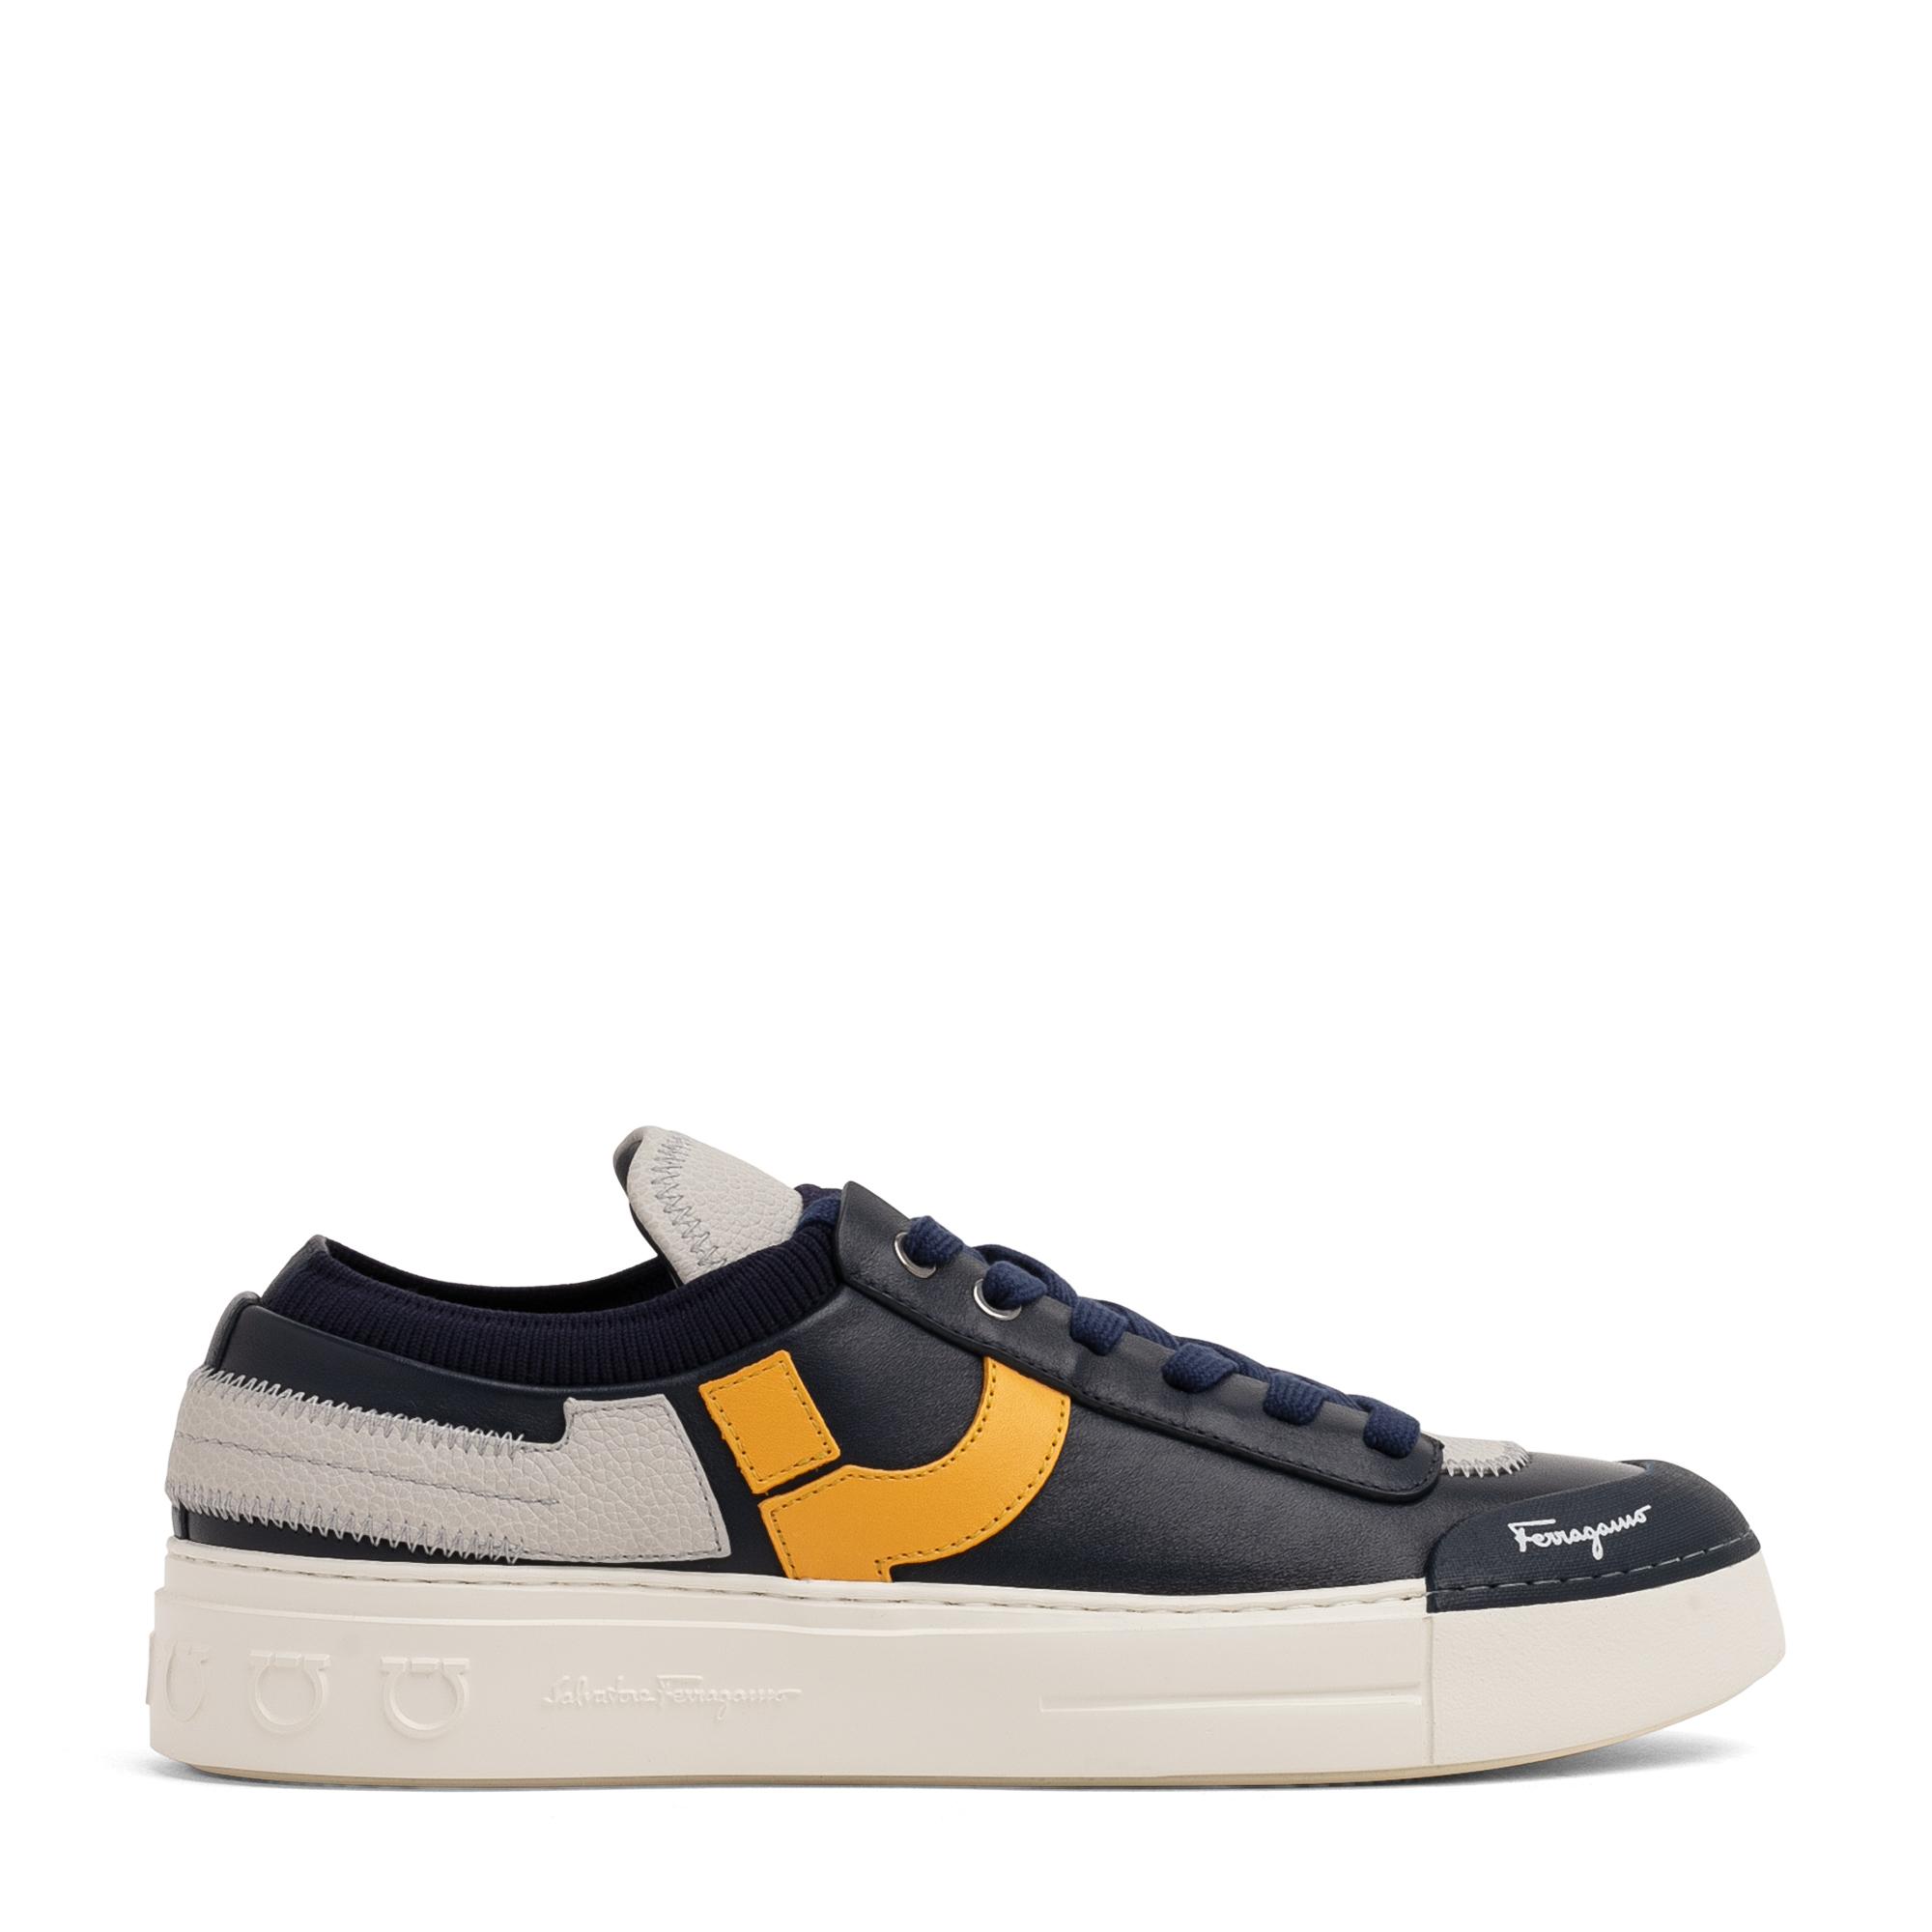 Notion sneakers